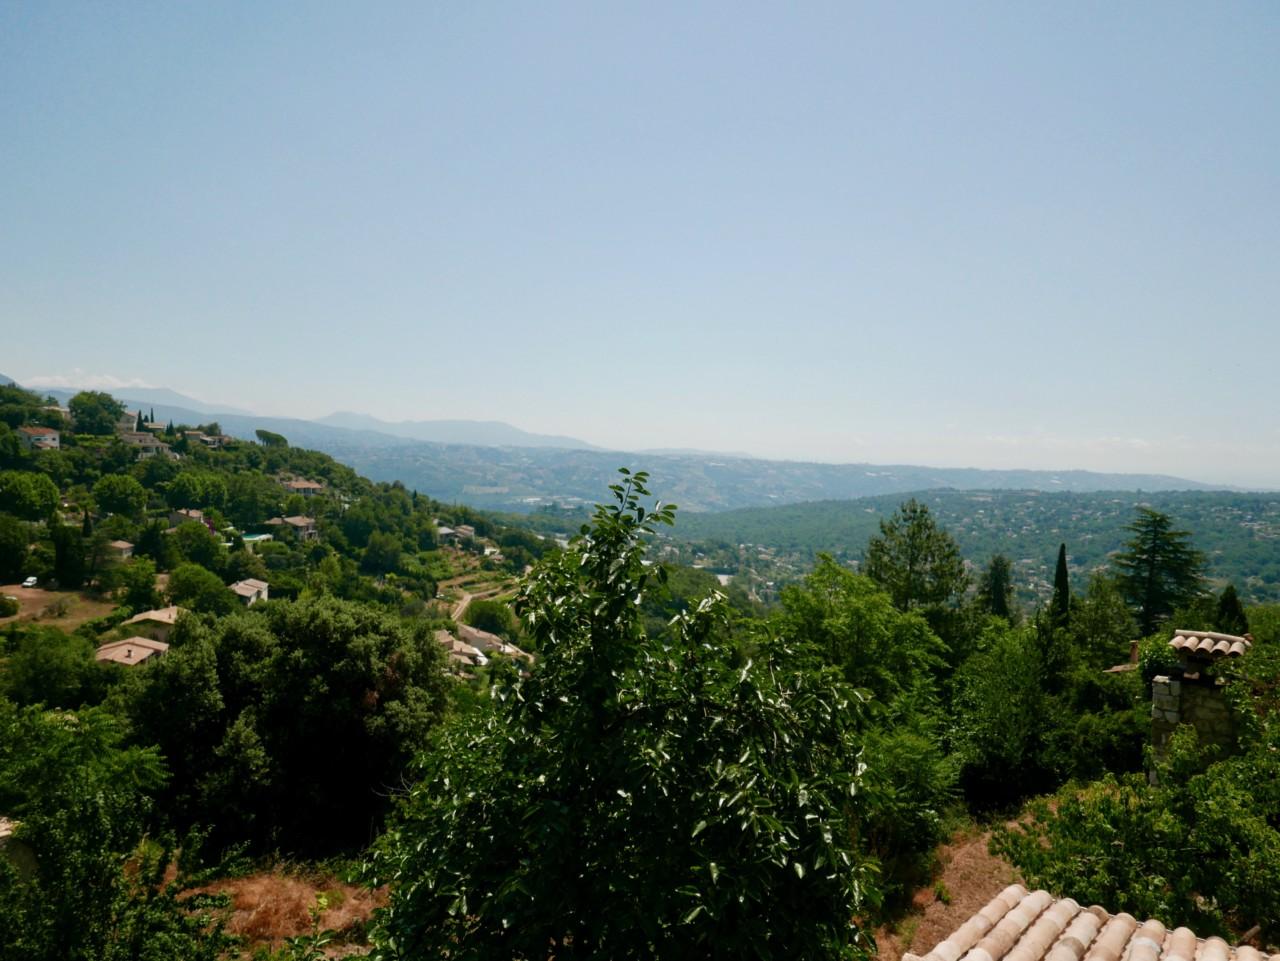 st-jeannet-view-provence-frankrike